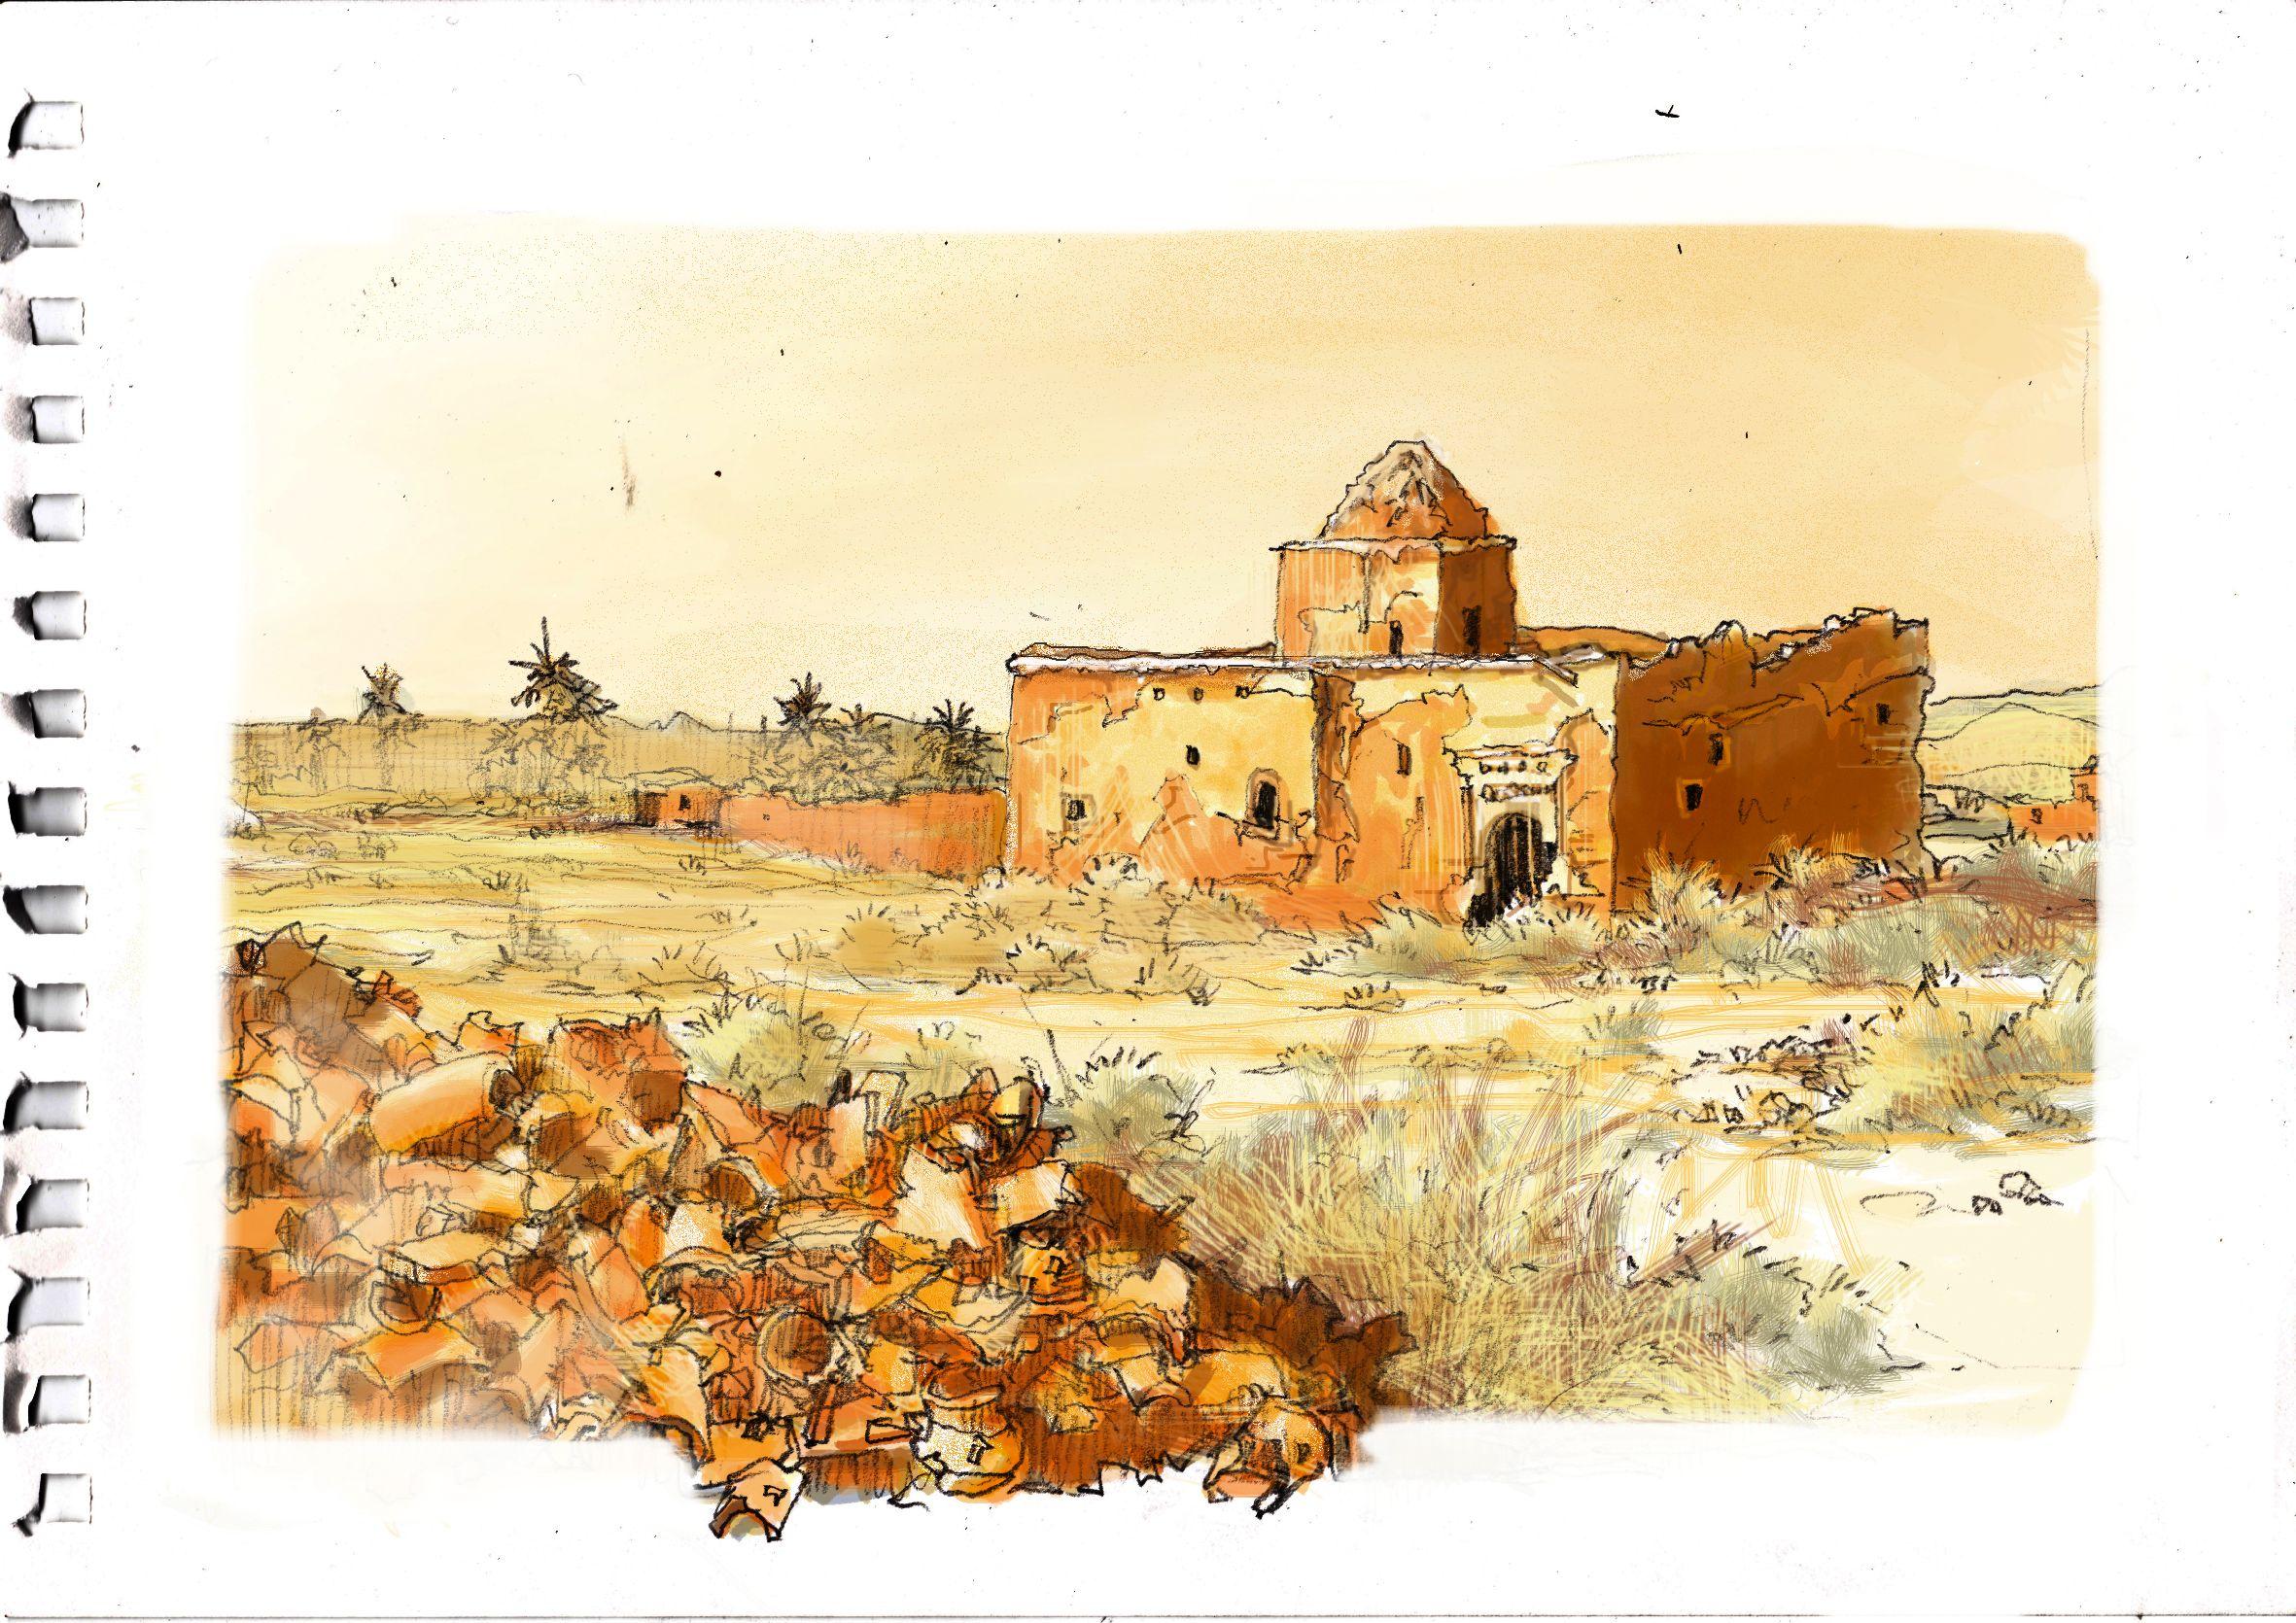 Lami G Rard Tinejdad (Maroc) Zaou A Abandonn E Et